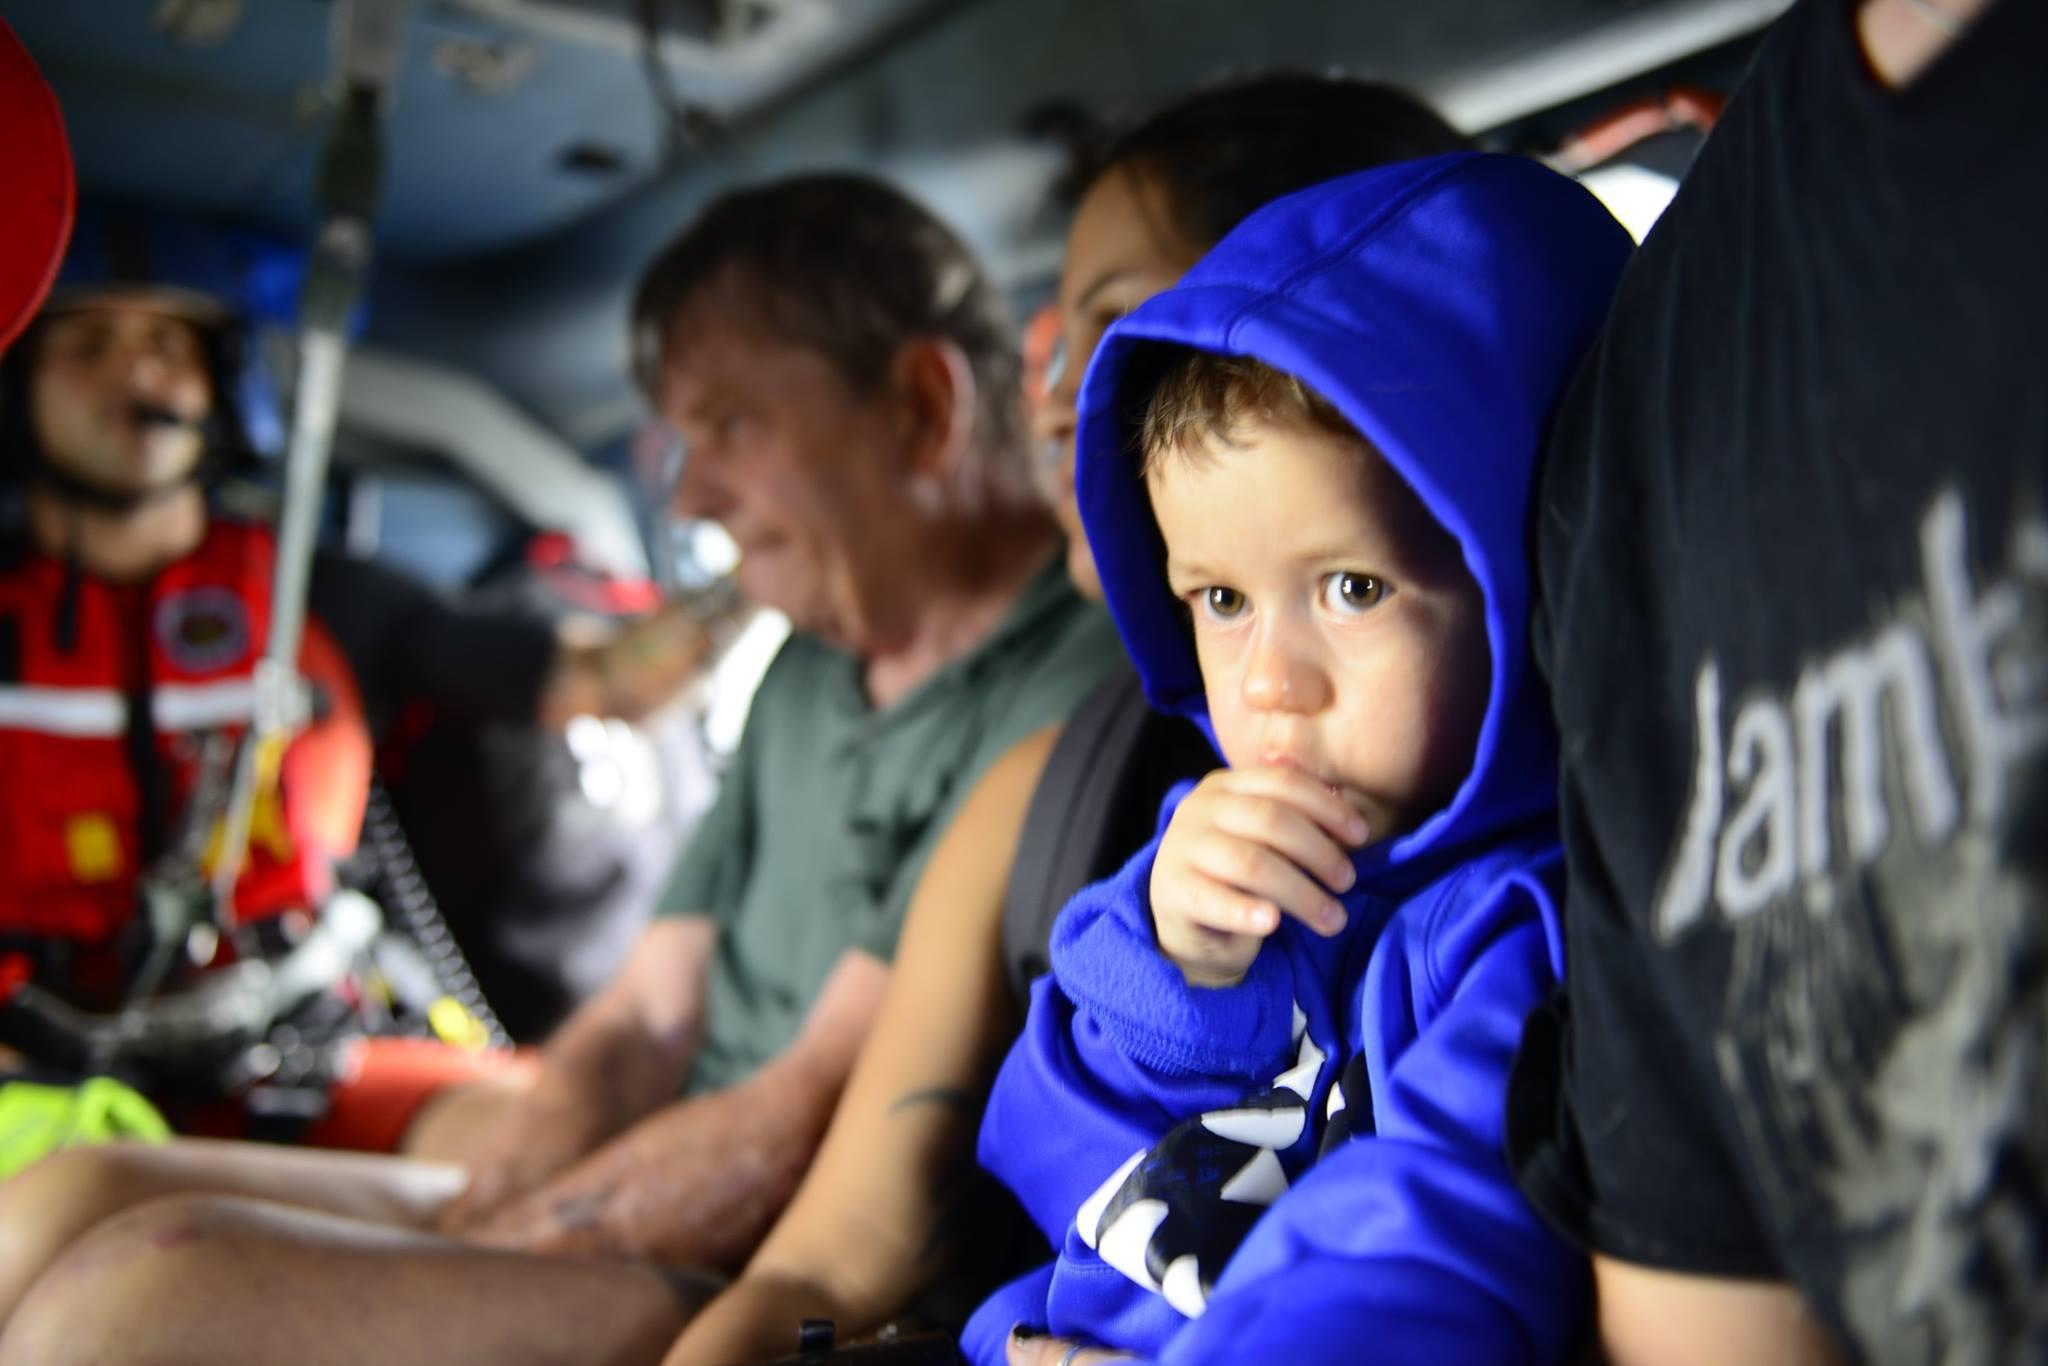 U.S. Coast Guard rescue of Hurricane Harvey victims along the Texas coast. U.S. Coast Guard photo by Petty Officer 3rd Class Johanna Strickland.